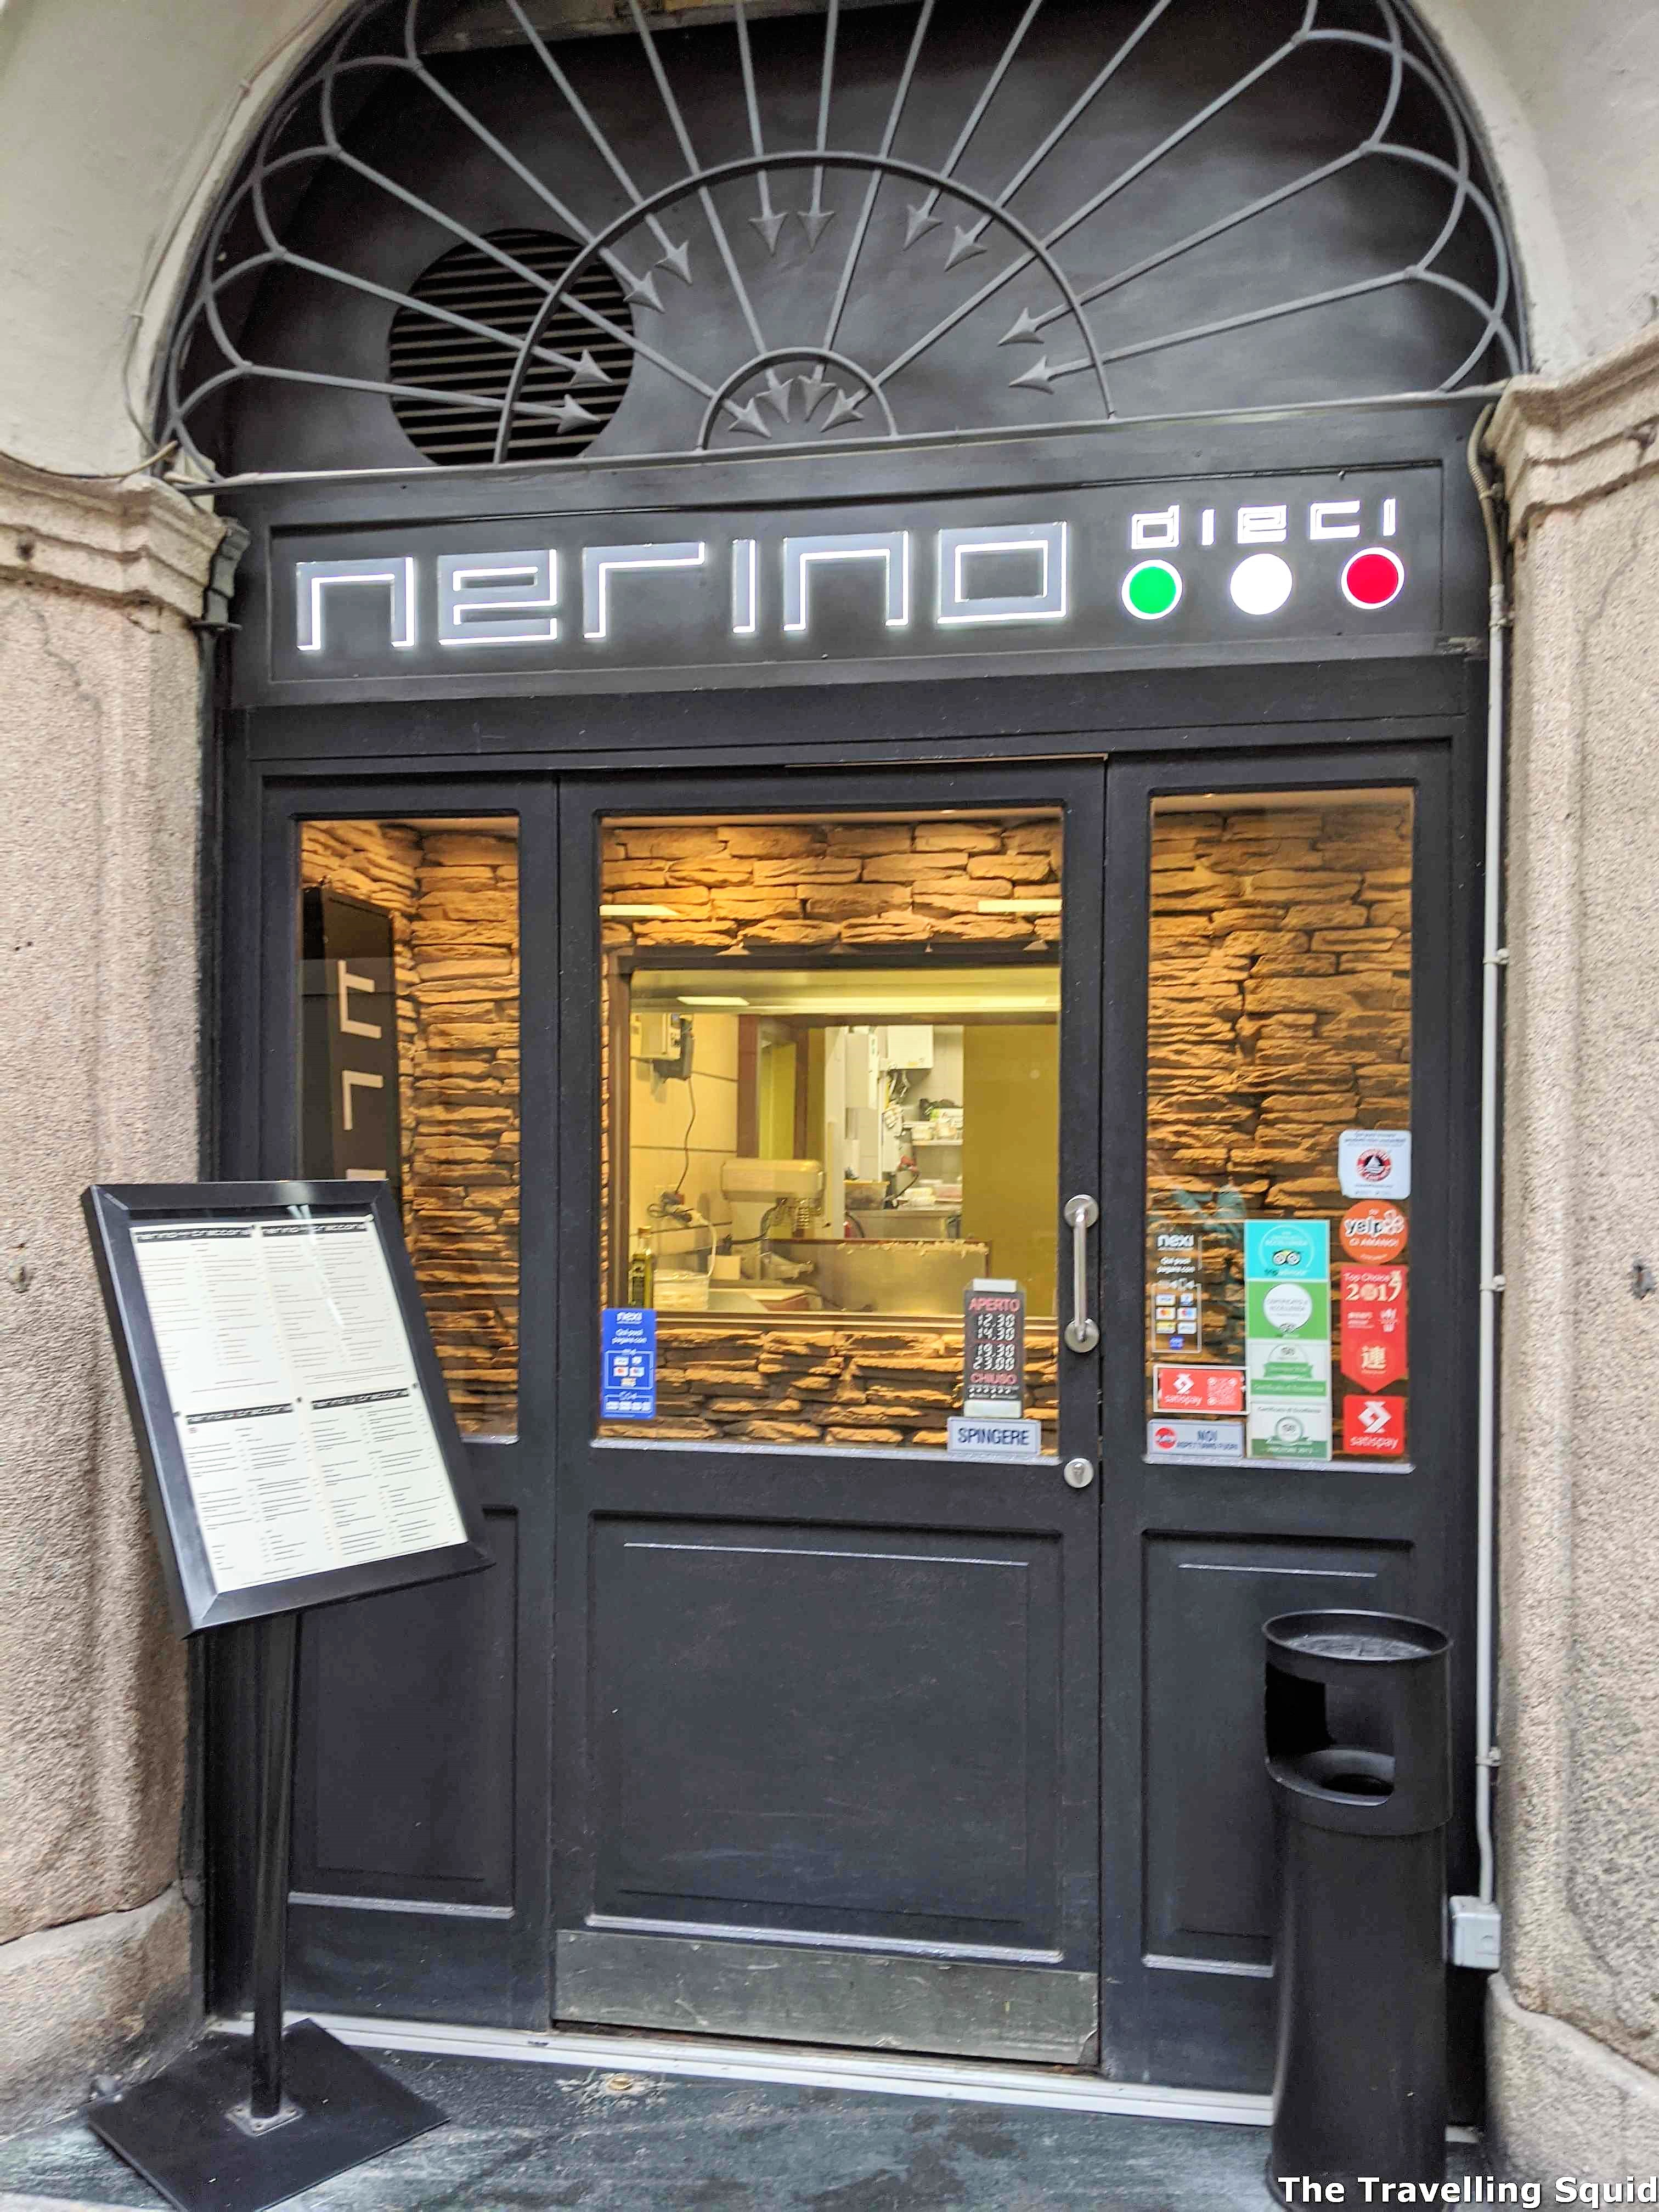 Lunch at Nerino Dieci Trattoria in Milan